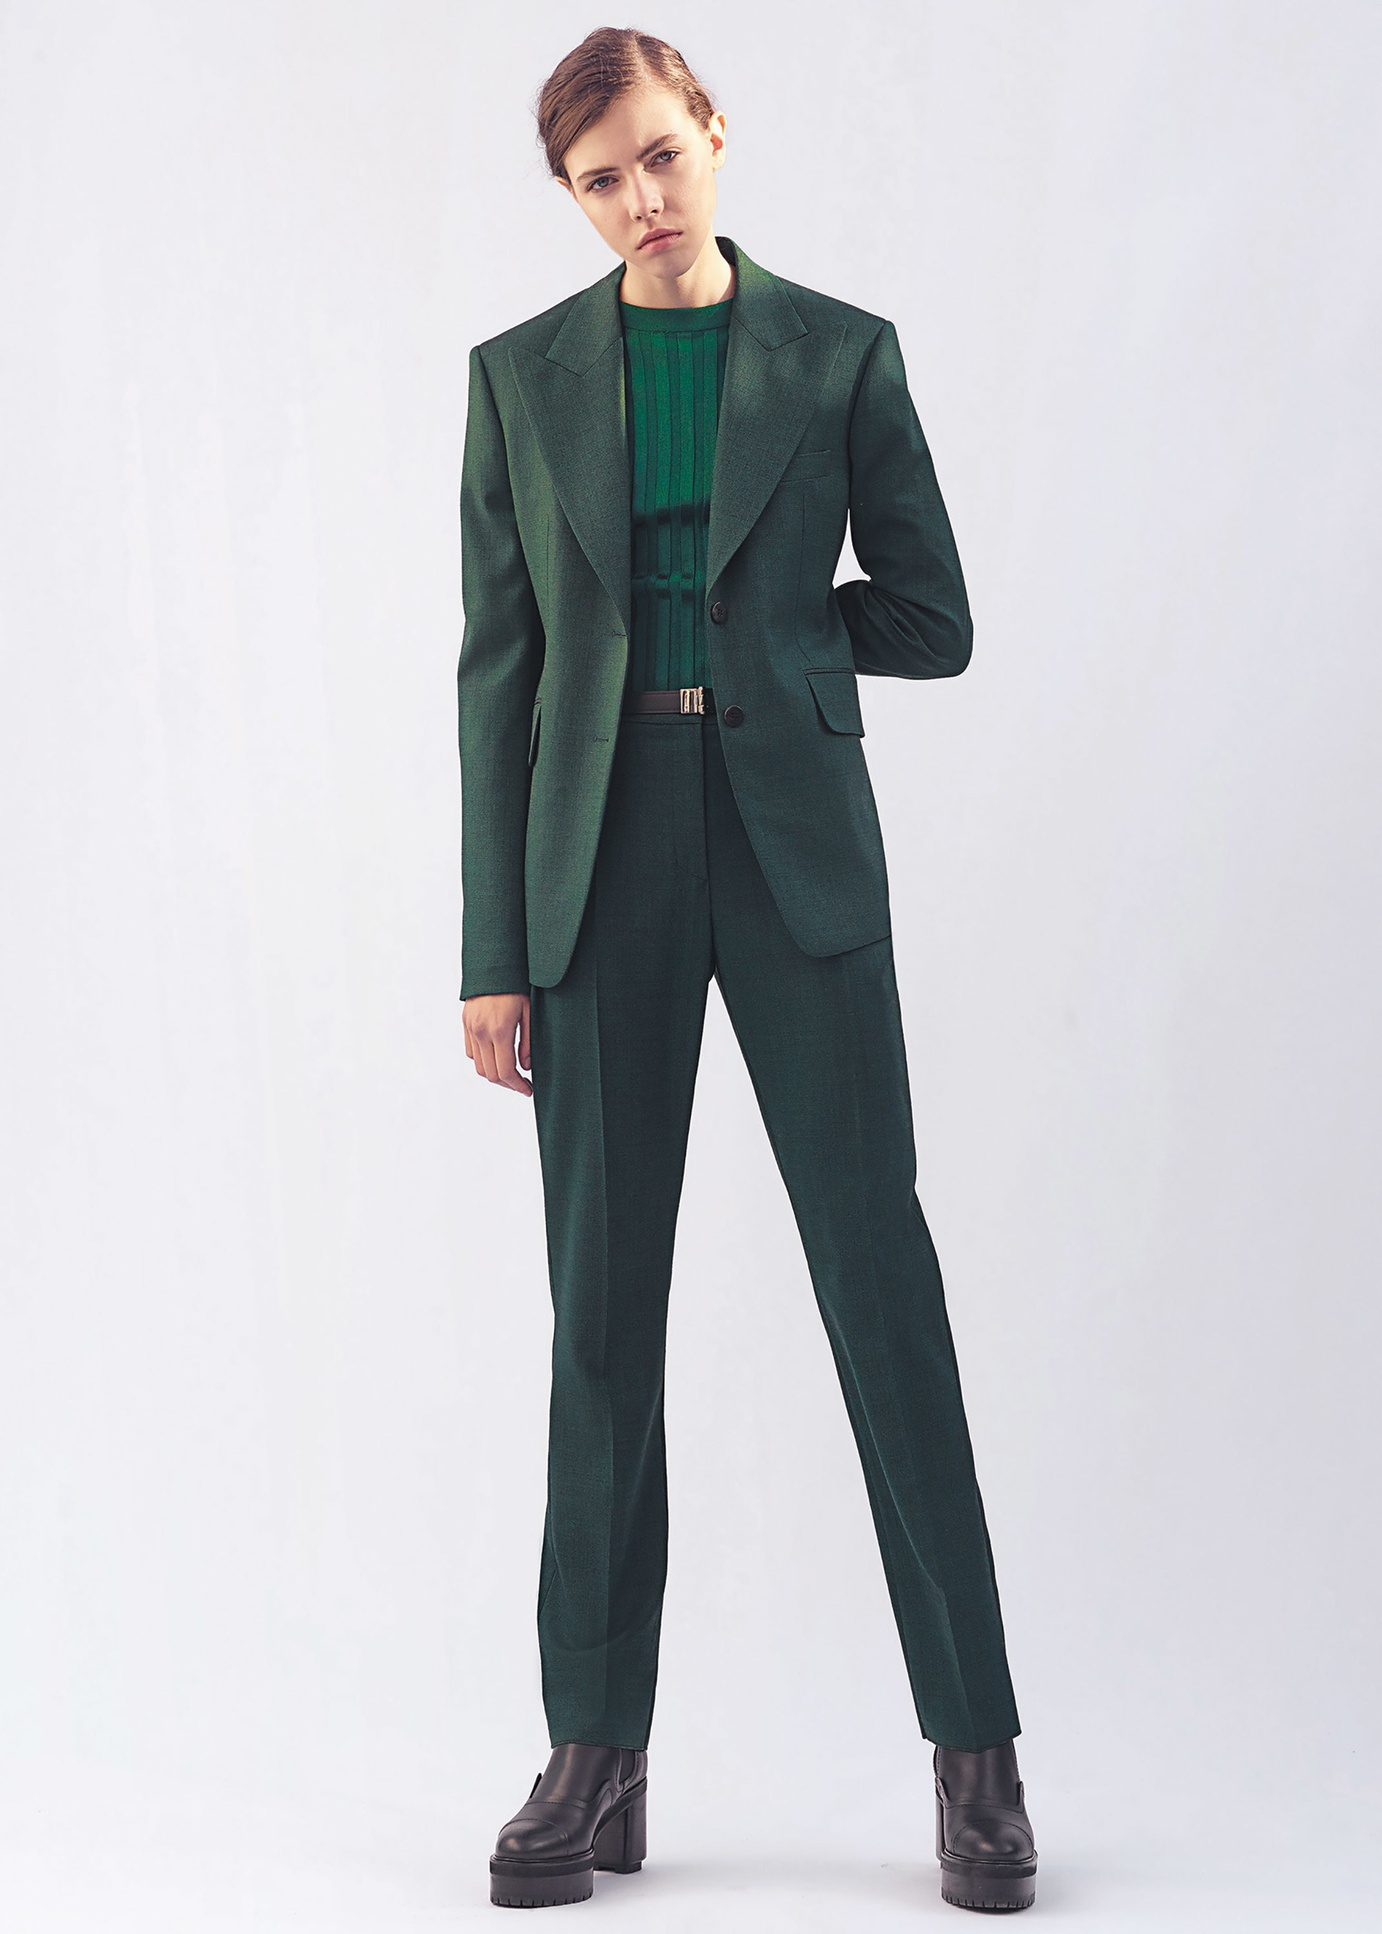 Hermès Pre-Fall/Winter 2017